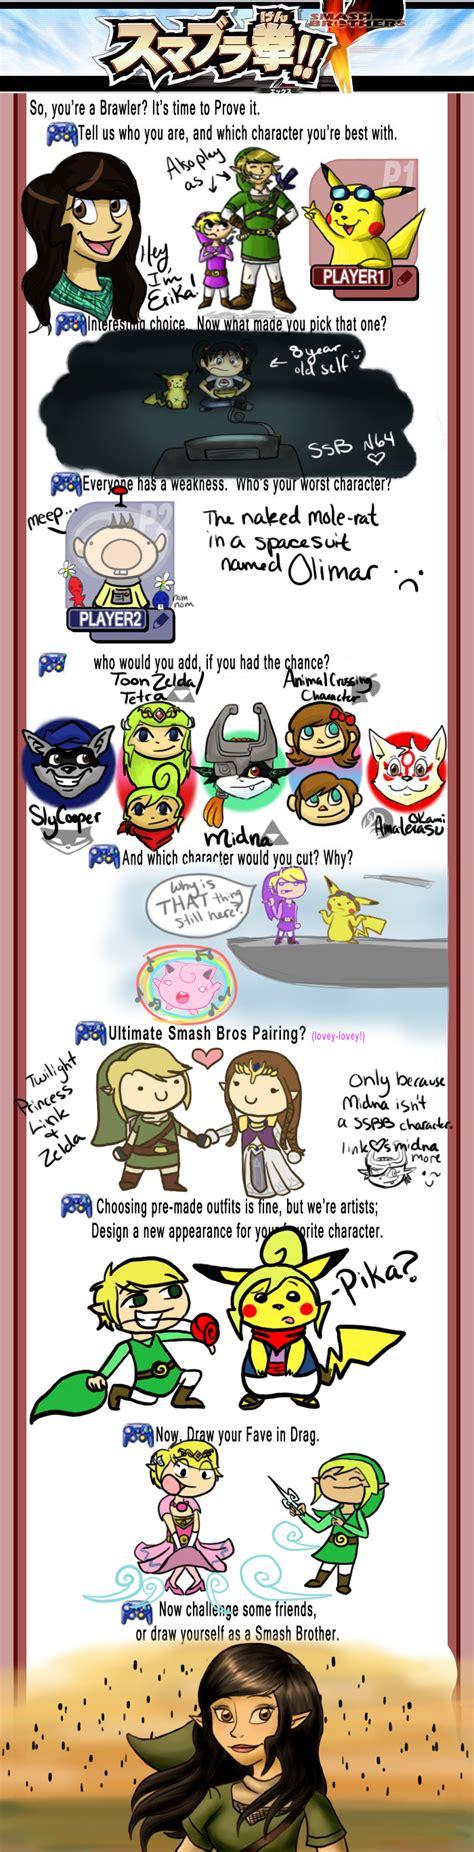 Super Smash Bros Meme - super smash bros brawl meme by peanutfilbert on deviantart